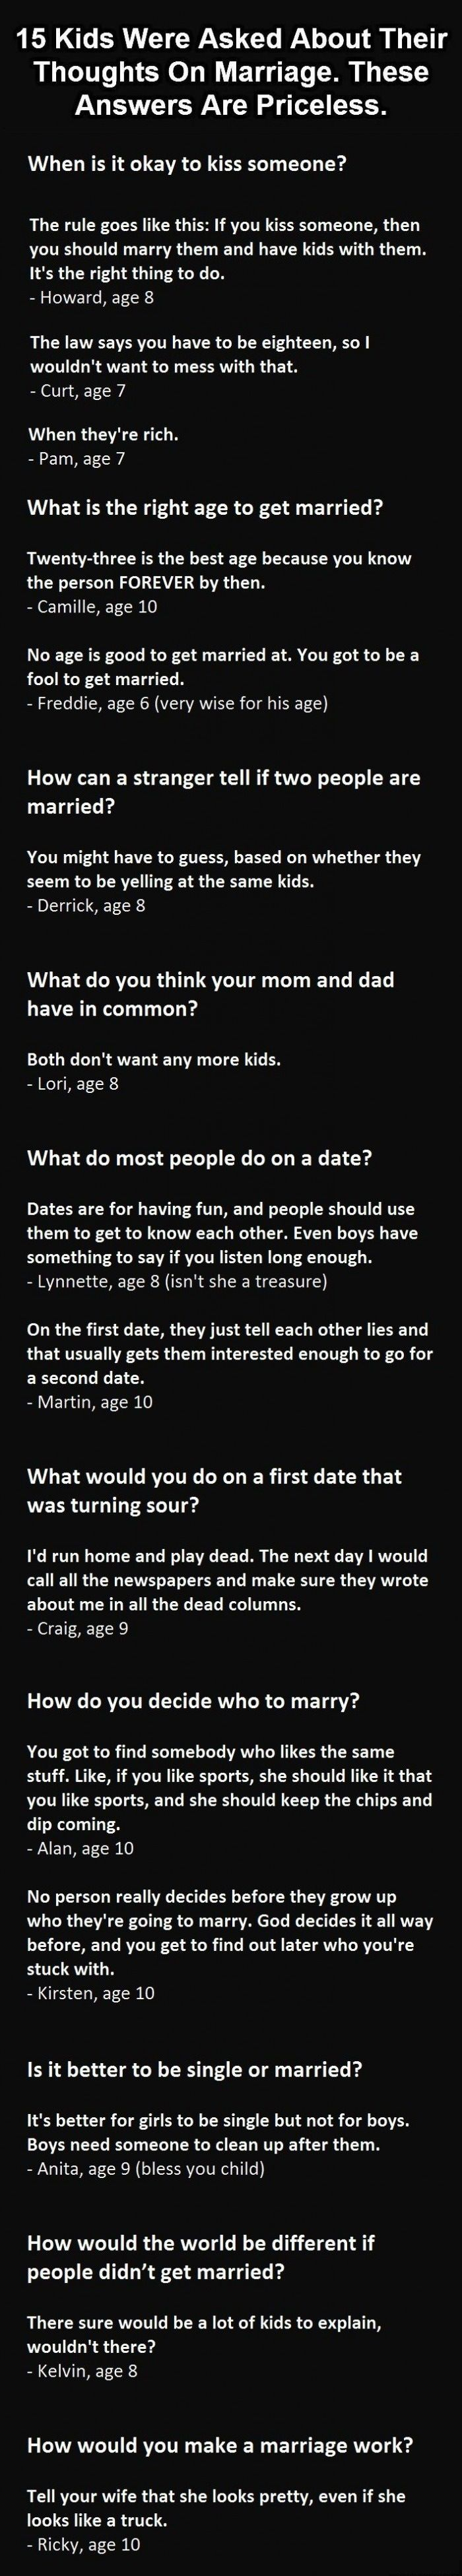 Humor Me Kids on Marriage